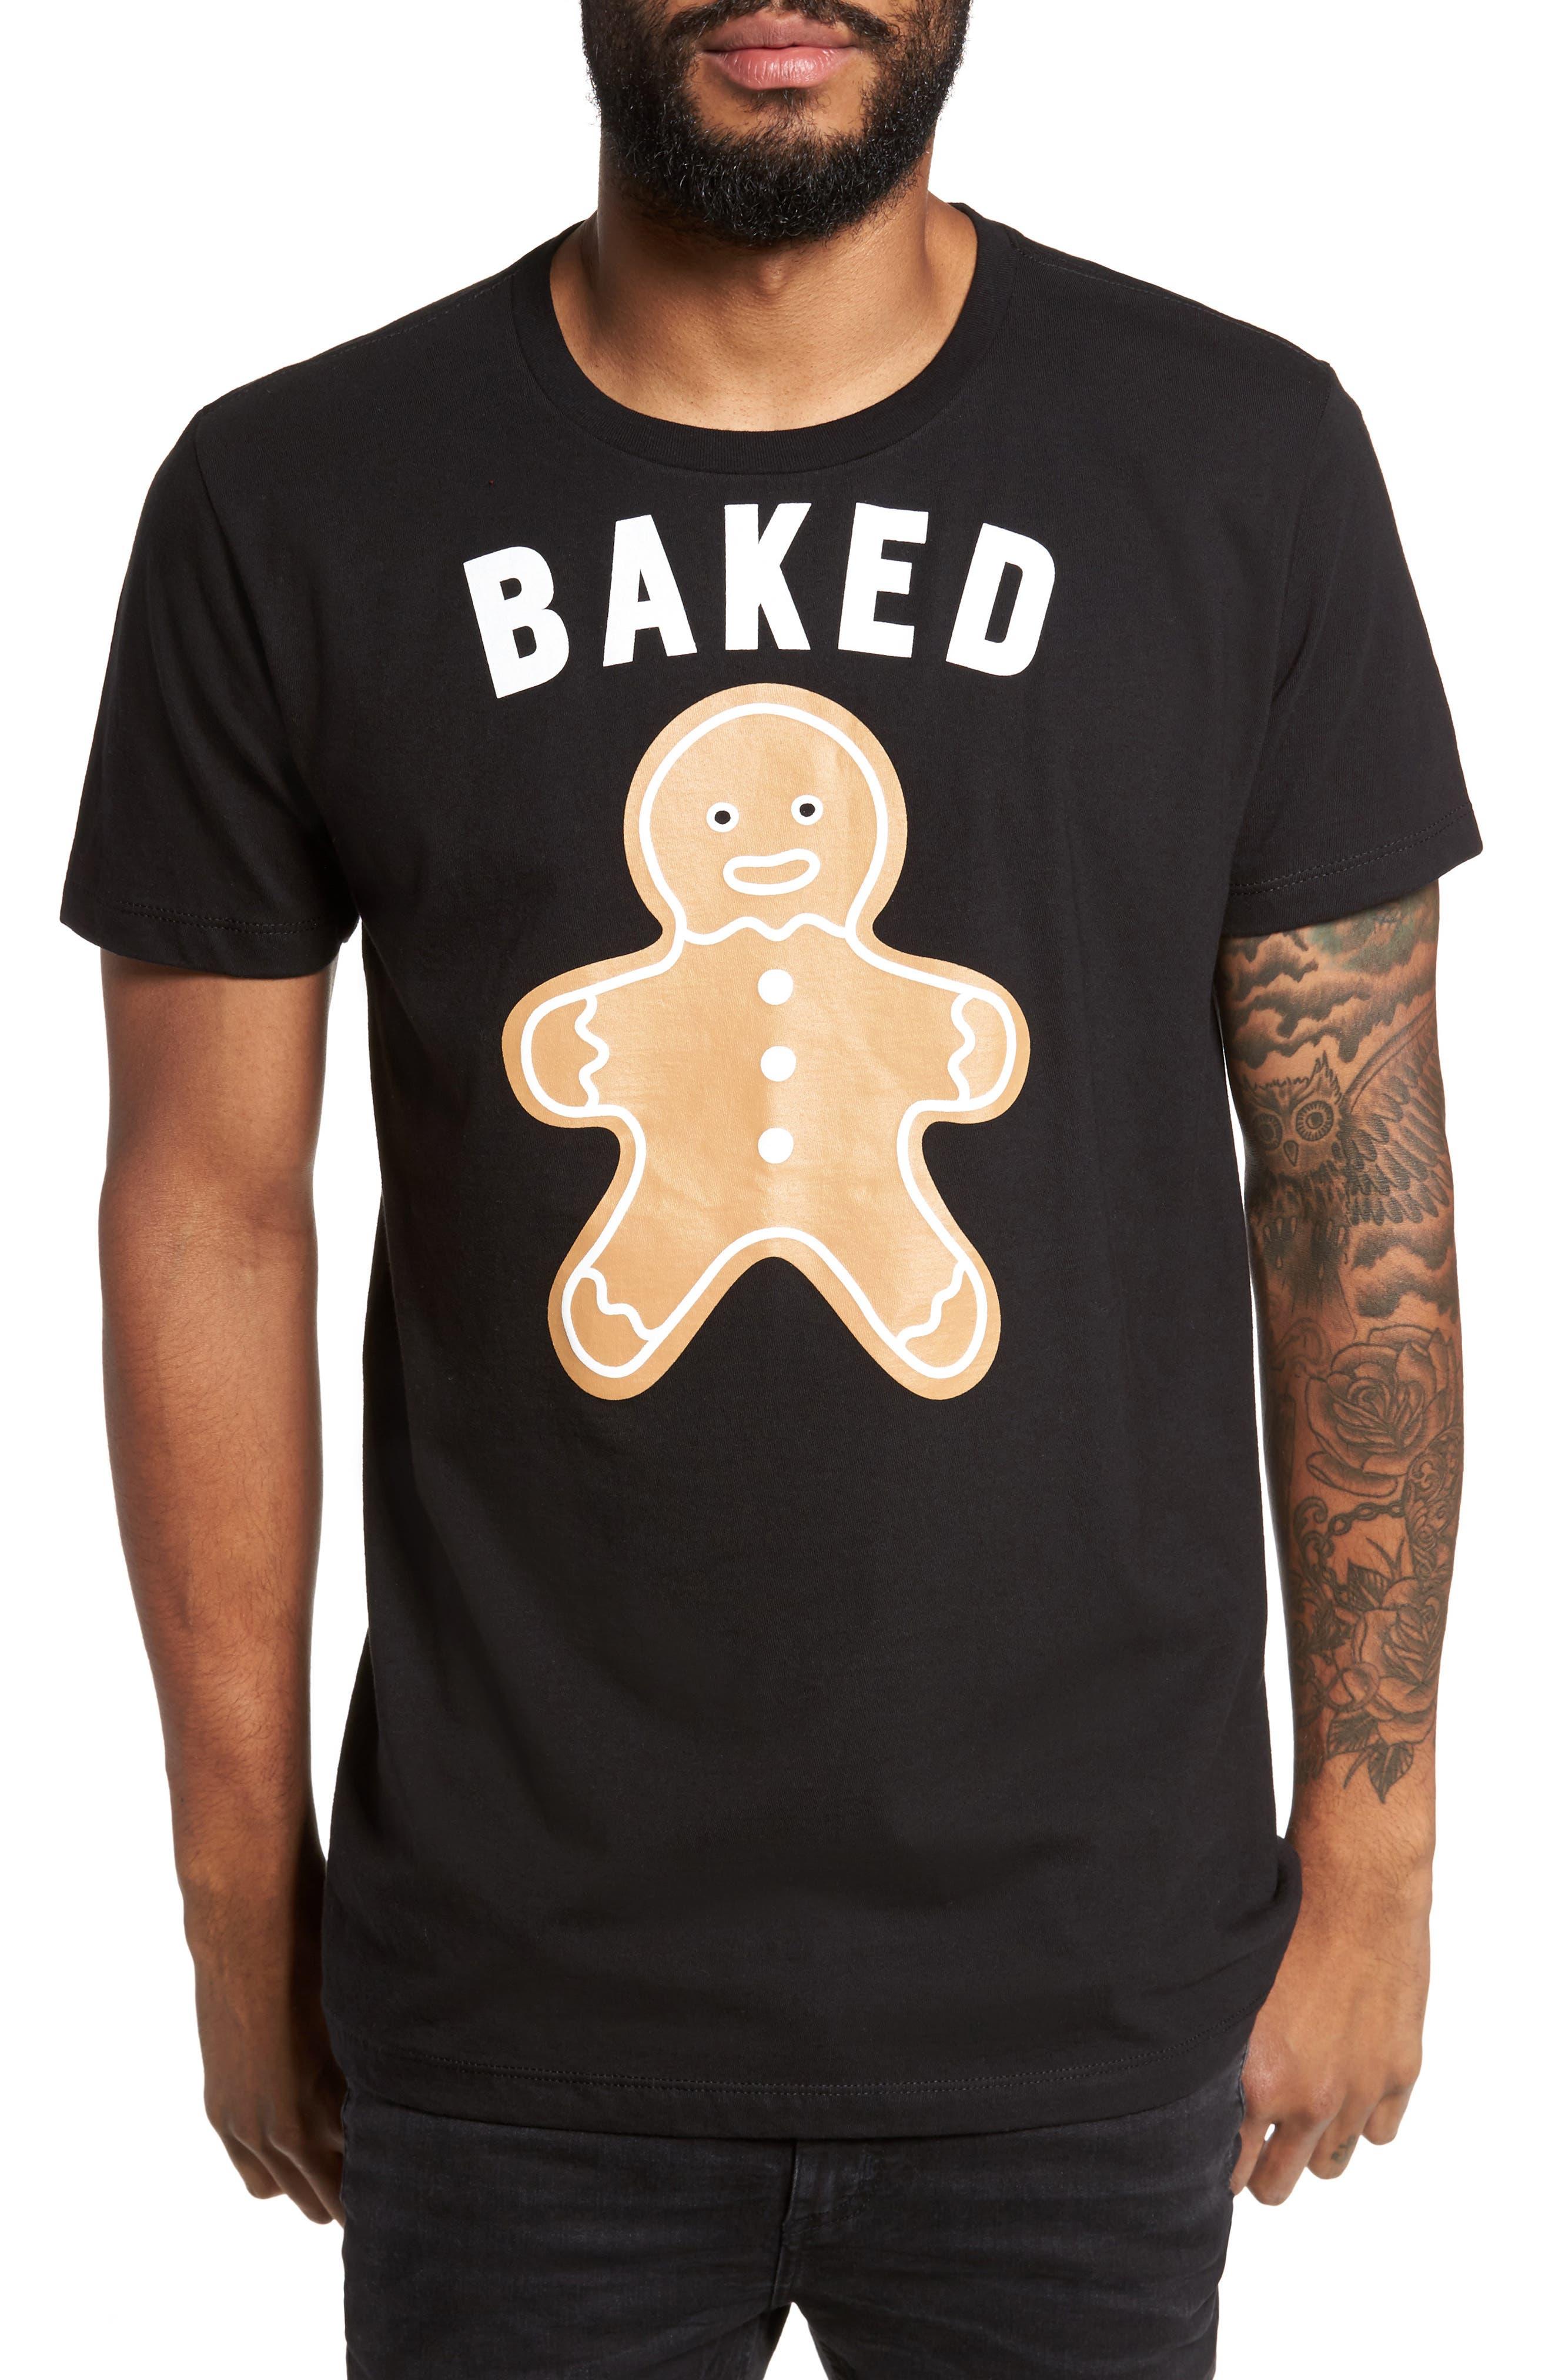 The Rail Baked T-Shirt